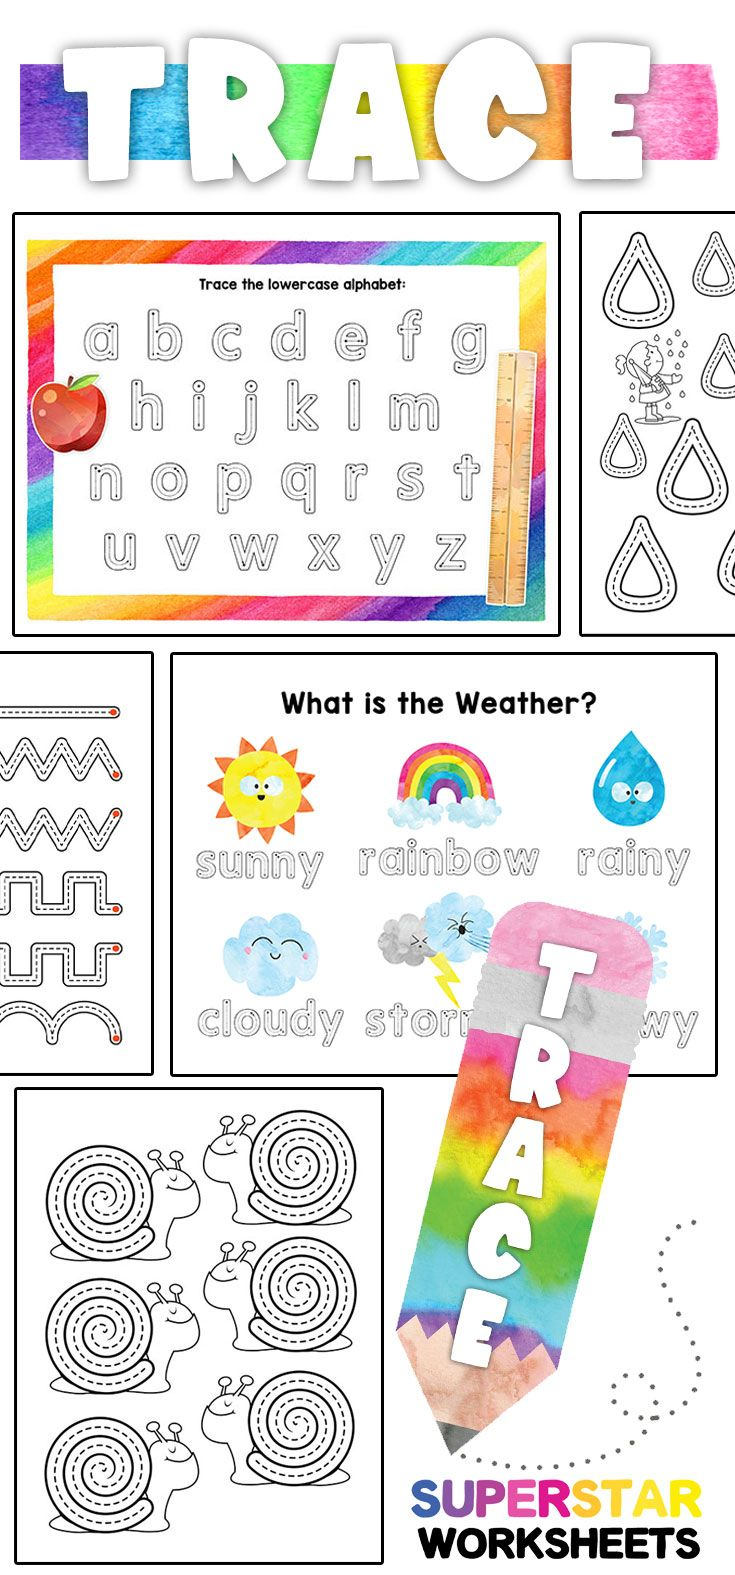 Huge Tracing Activity Bundle For Preschool Shape Tracing Worksheets Tracing Worksheets Preschool Unique Teaching Resources [ 1575 x 735 Pixel ]